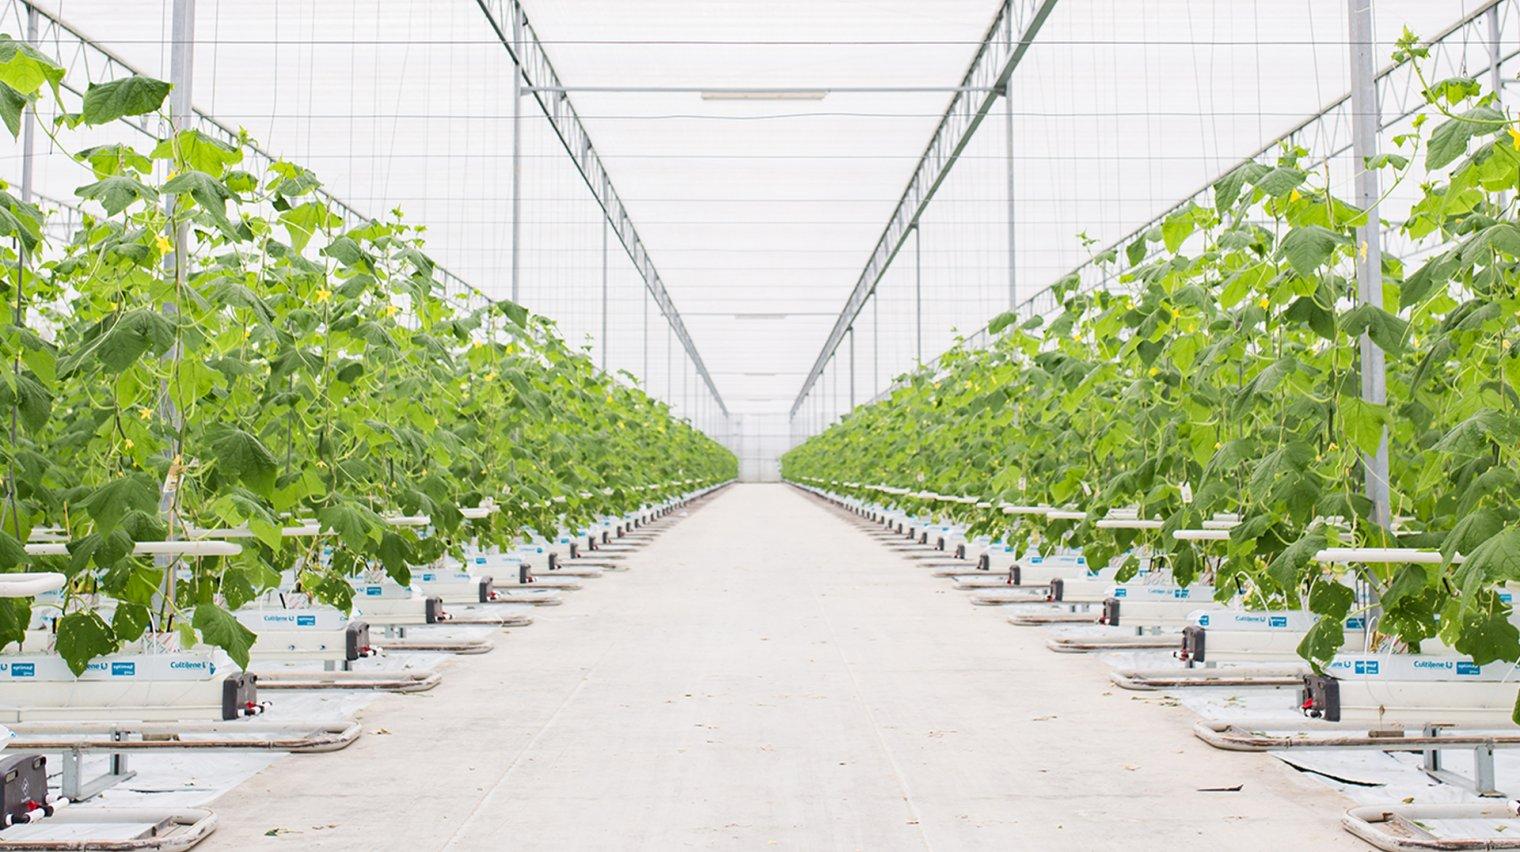 komkommer plantage